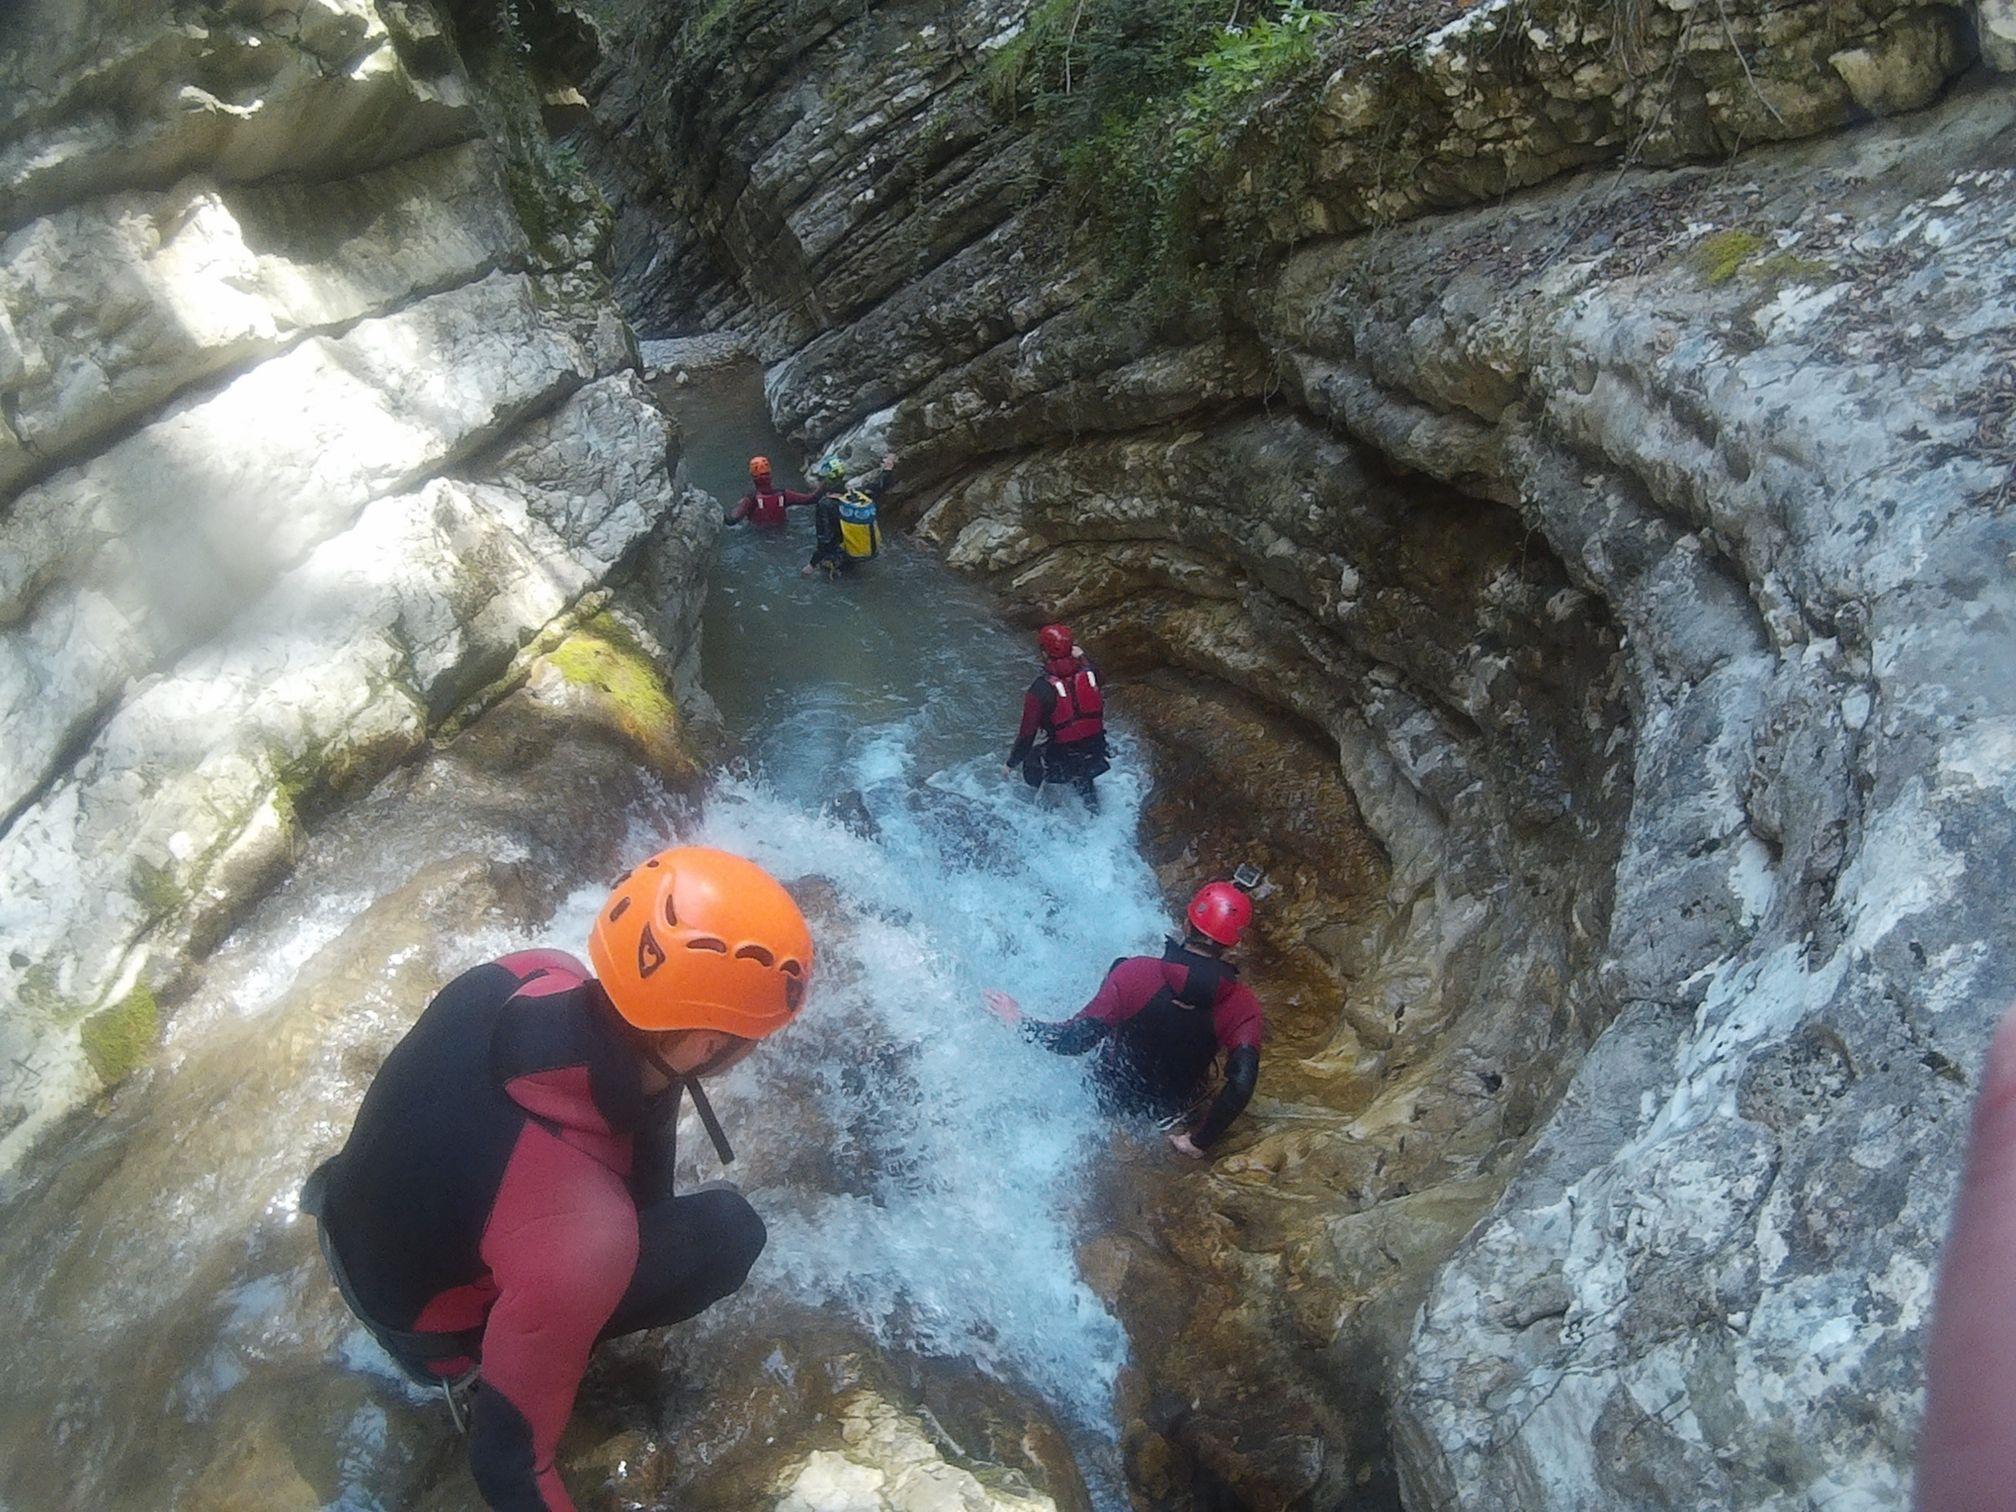 Torrente Rionero Percorso Canyoning Trentino lungo